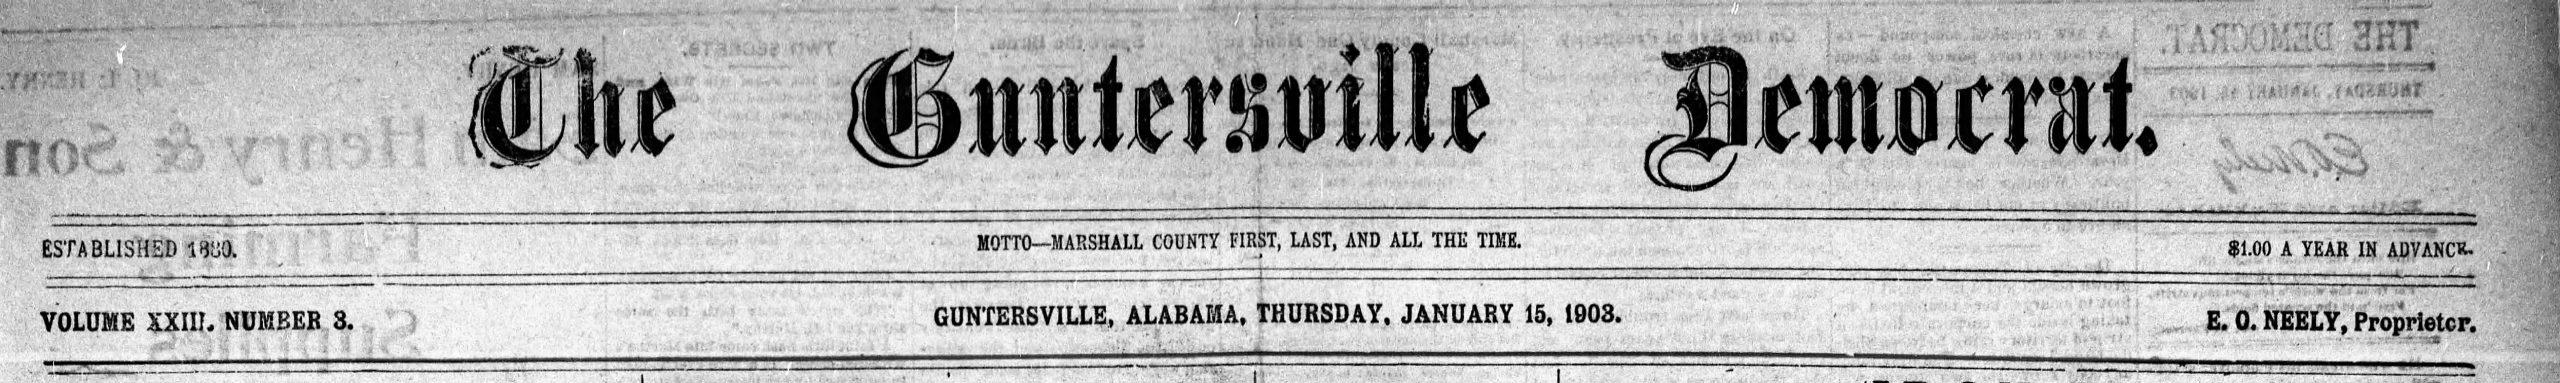 PATRON - Frozen mink captured, 61 applied for Teacher's exam and visitors in Guntersville local news 1903